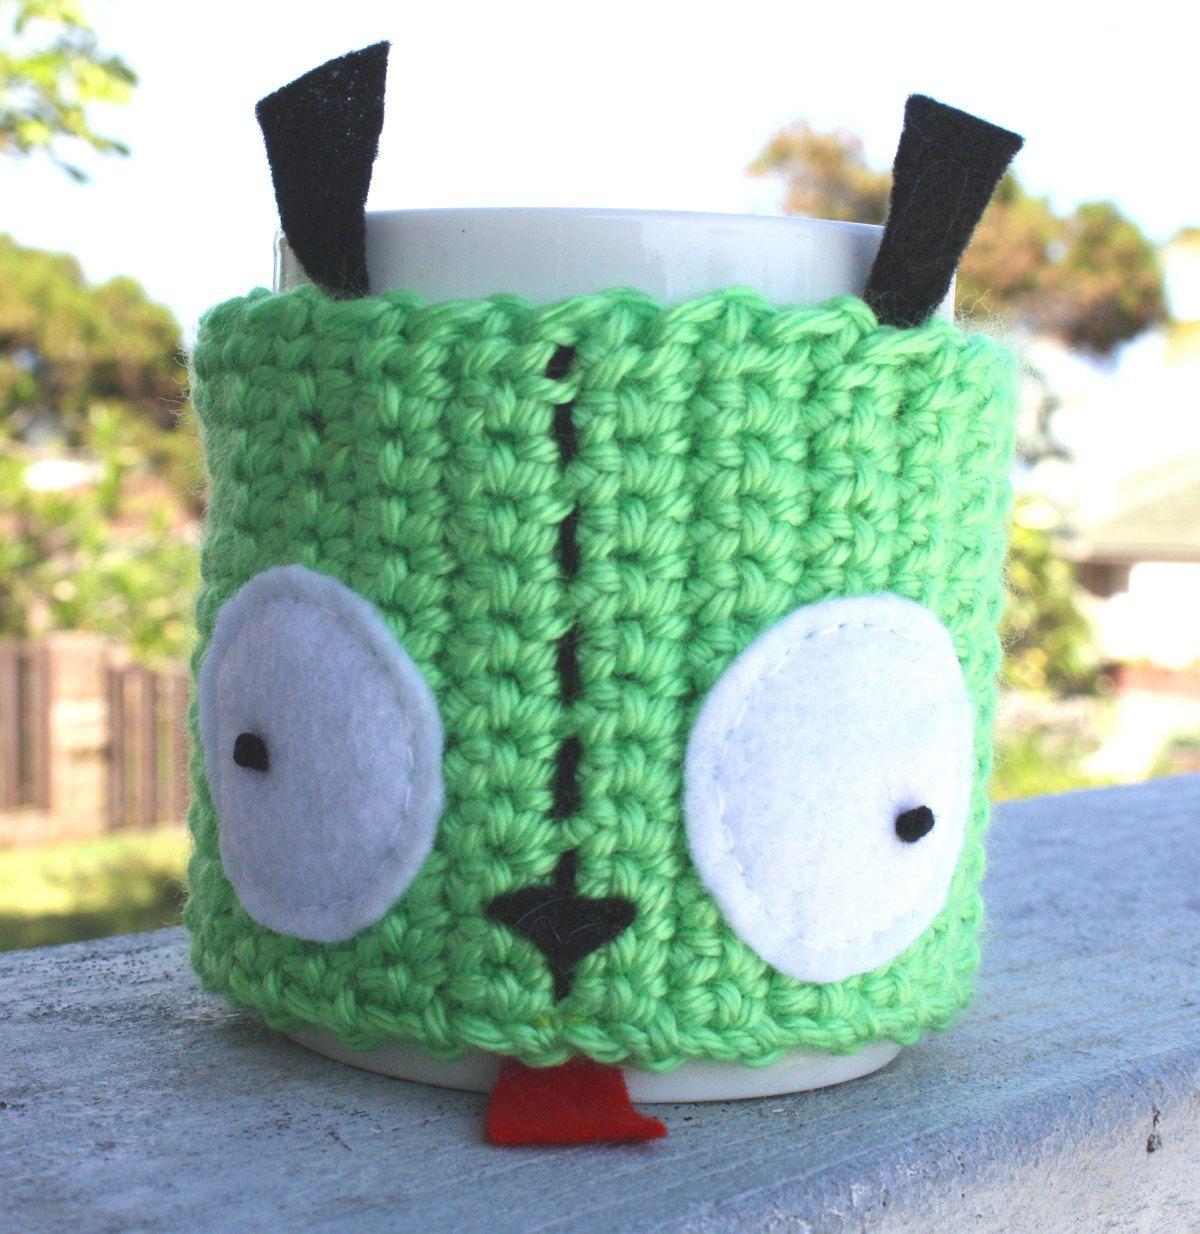 Gir ish Coffee Mug Tea Cup Cozy Invader Zim Inspired